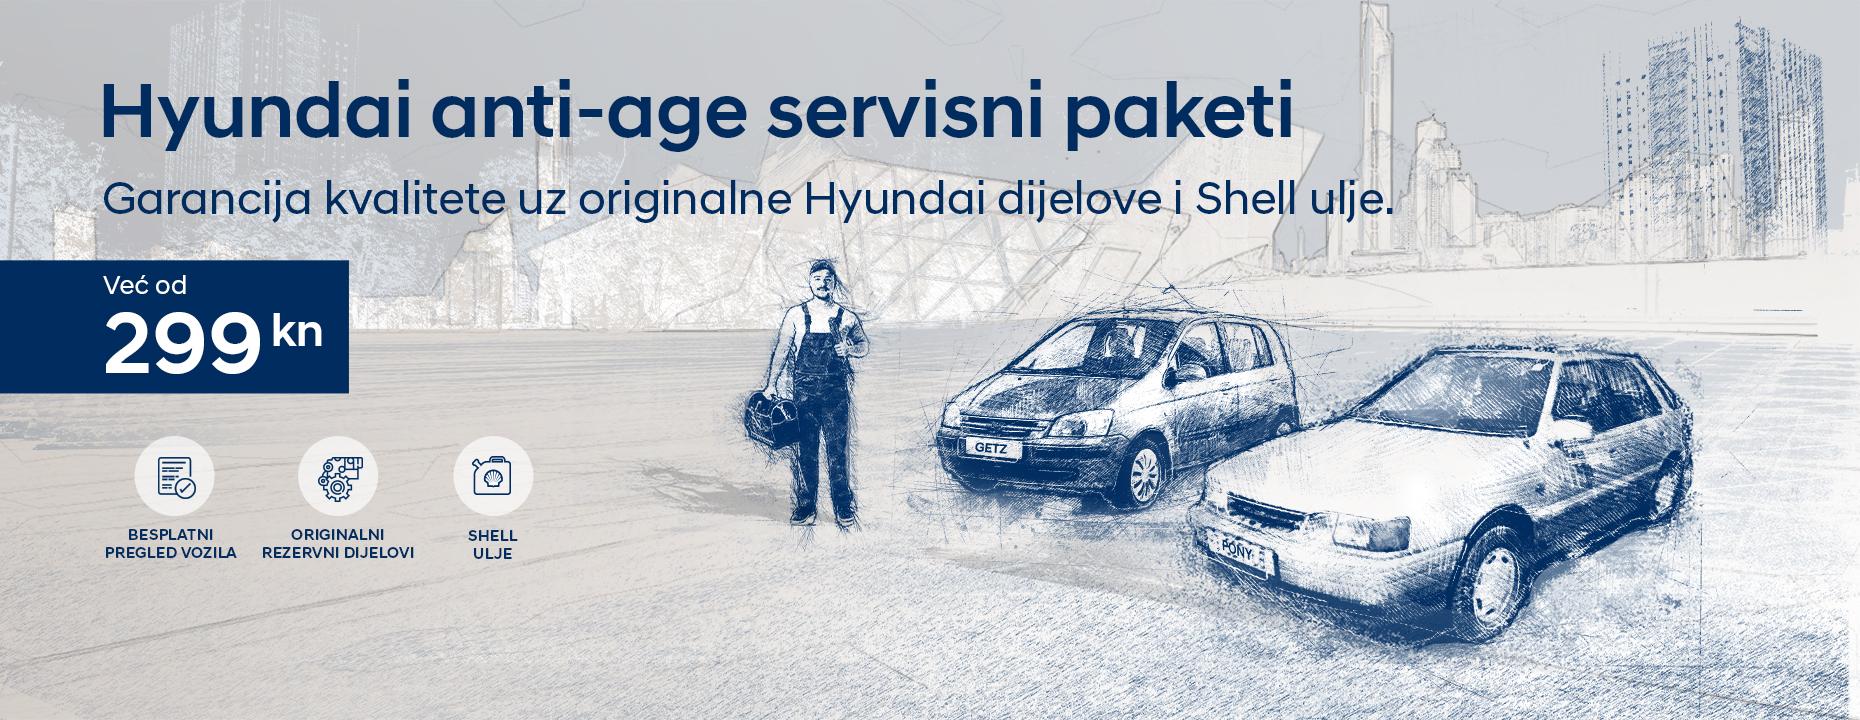 Hyundai anti-age servisni paketi